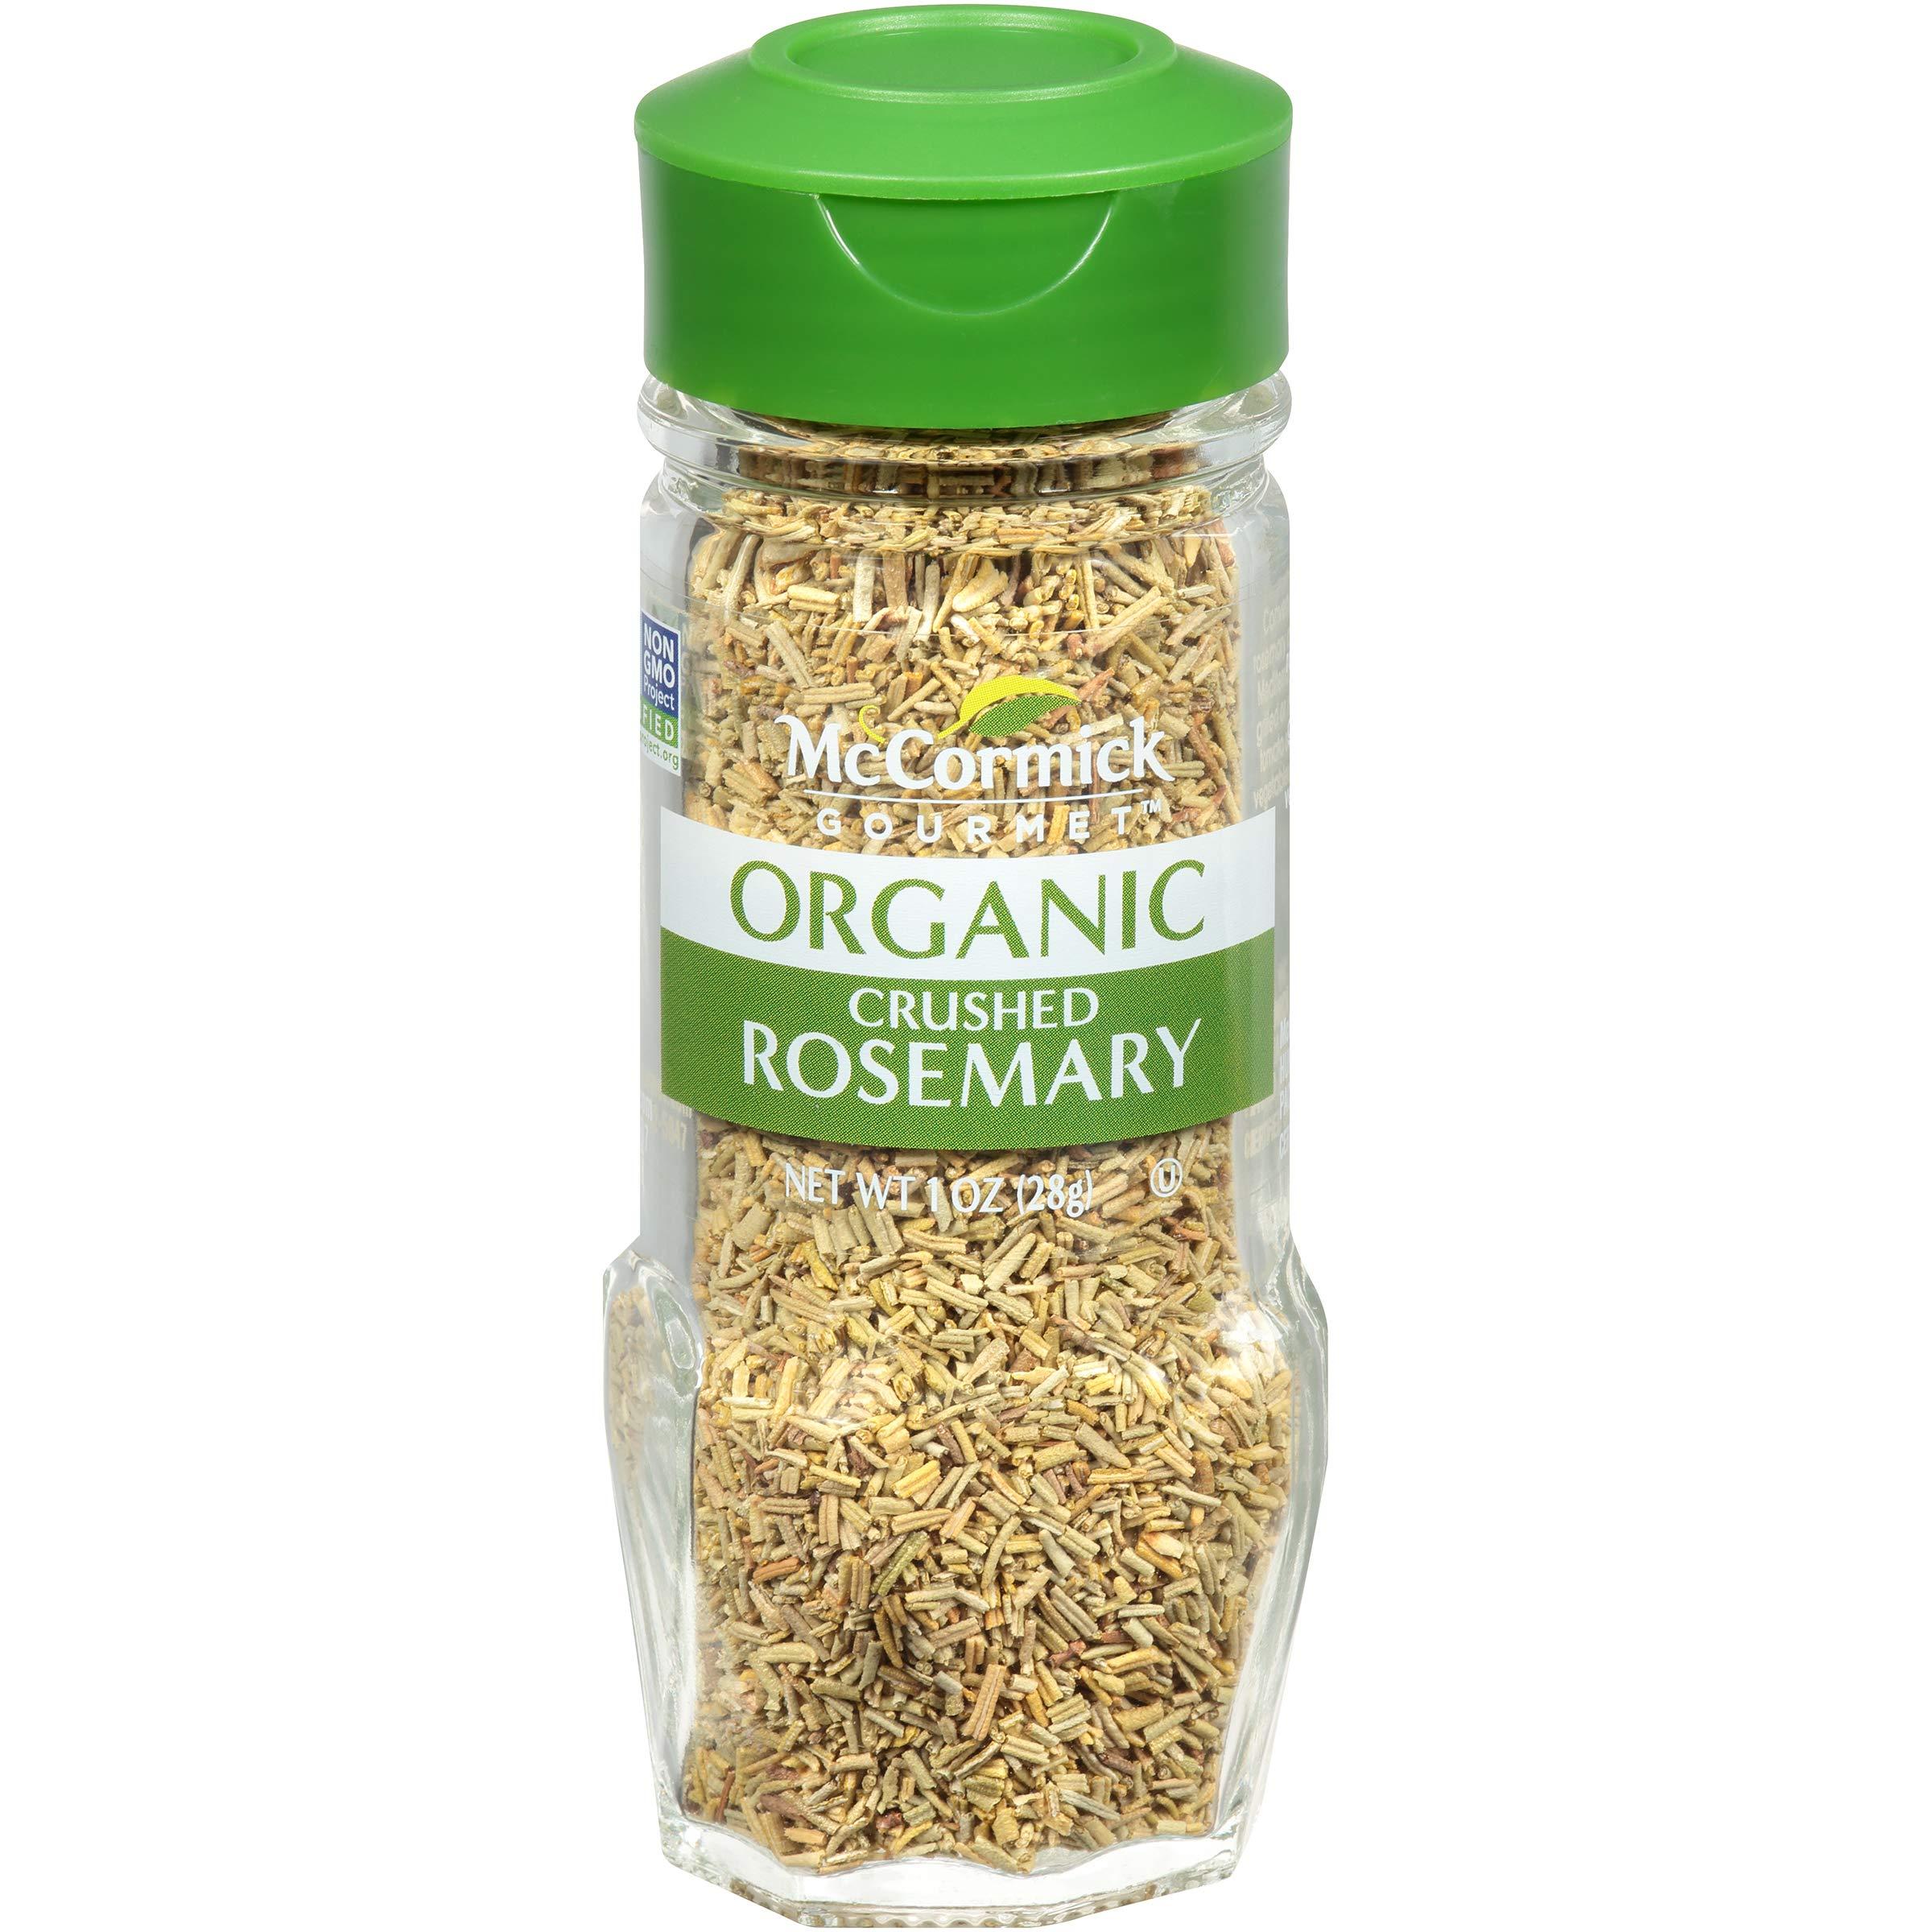 McCormick Gourmet Organic Crushed Rosemary, 1 oz